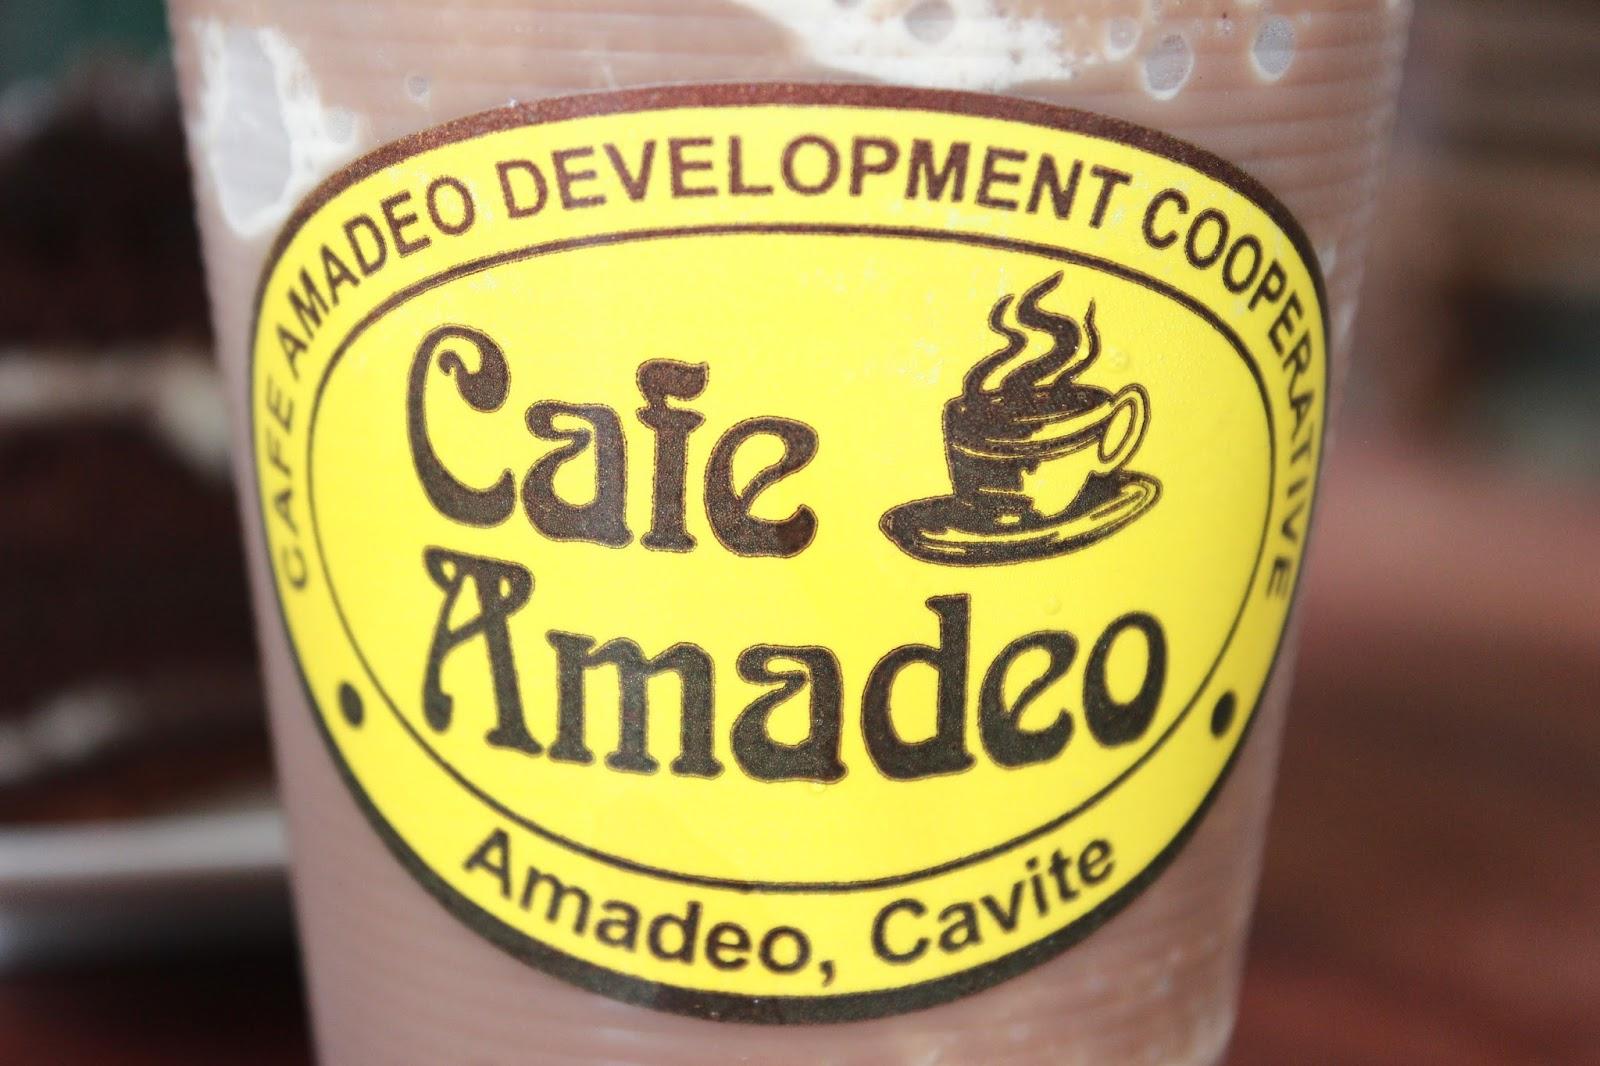 Cafe Amadeo Development Cooperative Case Study